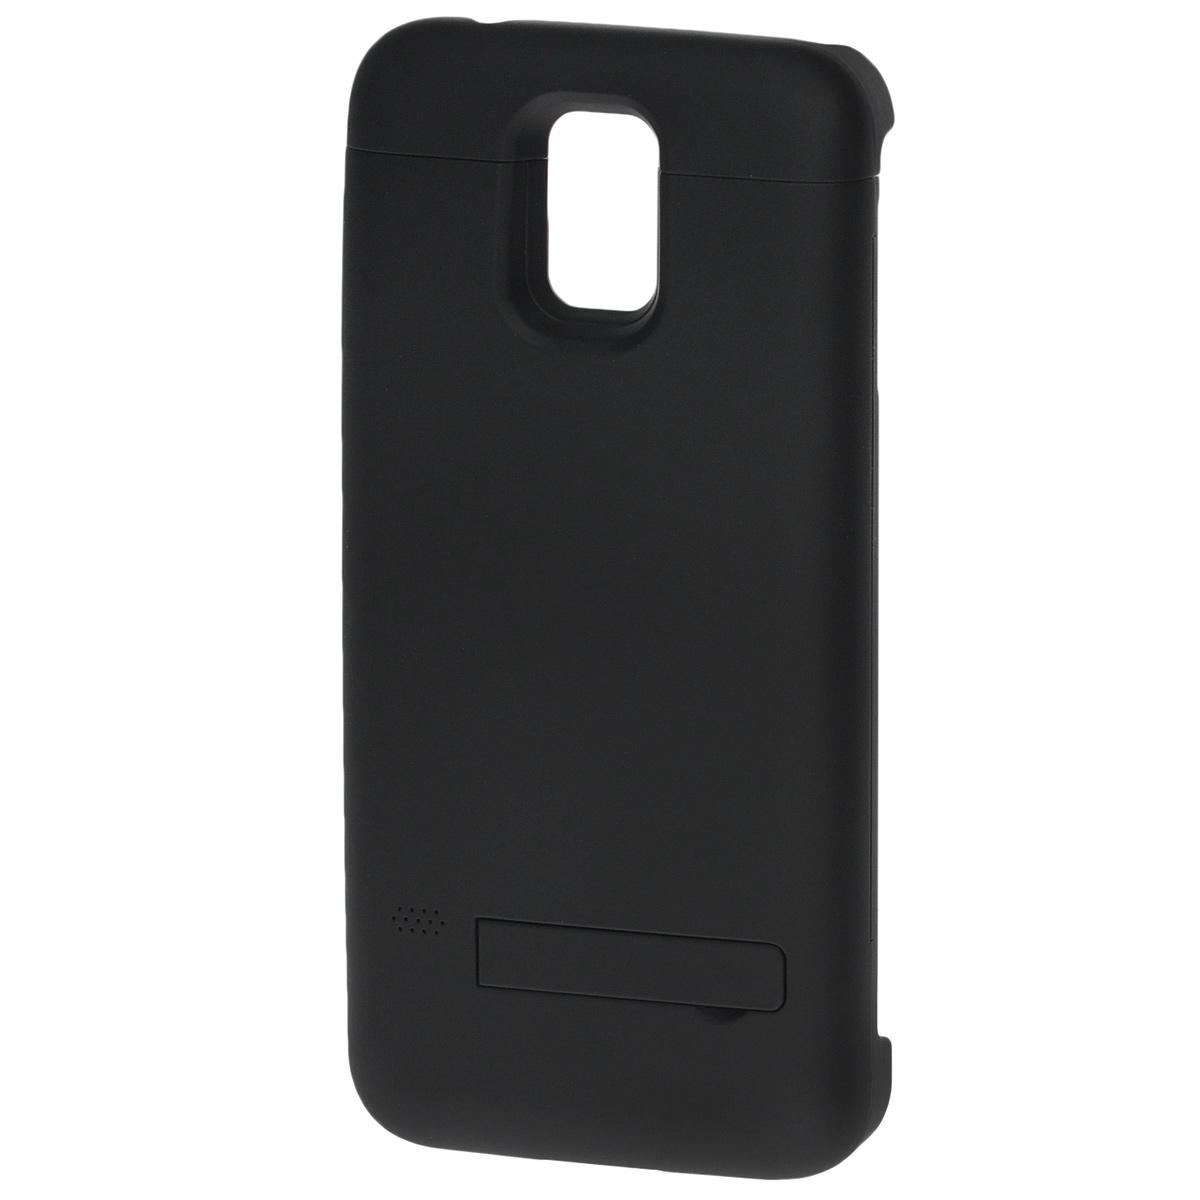 EXEQ HelpinG-SC08 чехол-аккумулятор для Samsung Galaxy S5, Black (3300 мАч, клип-кейс) цена и фото